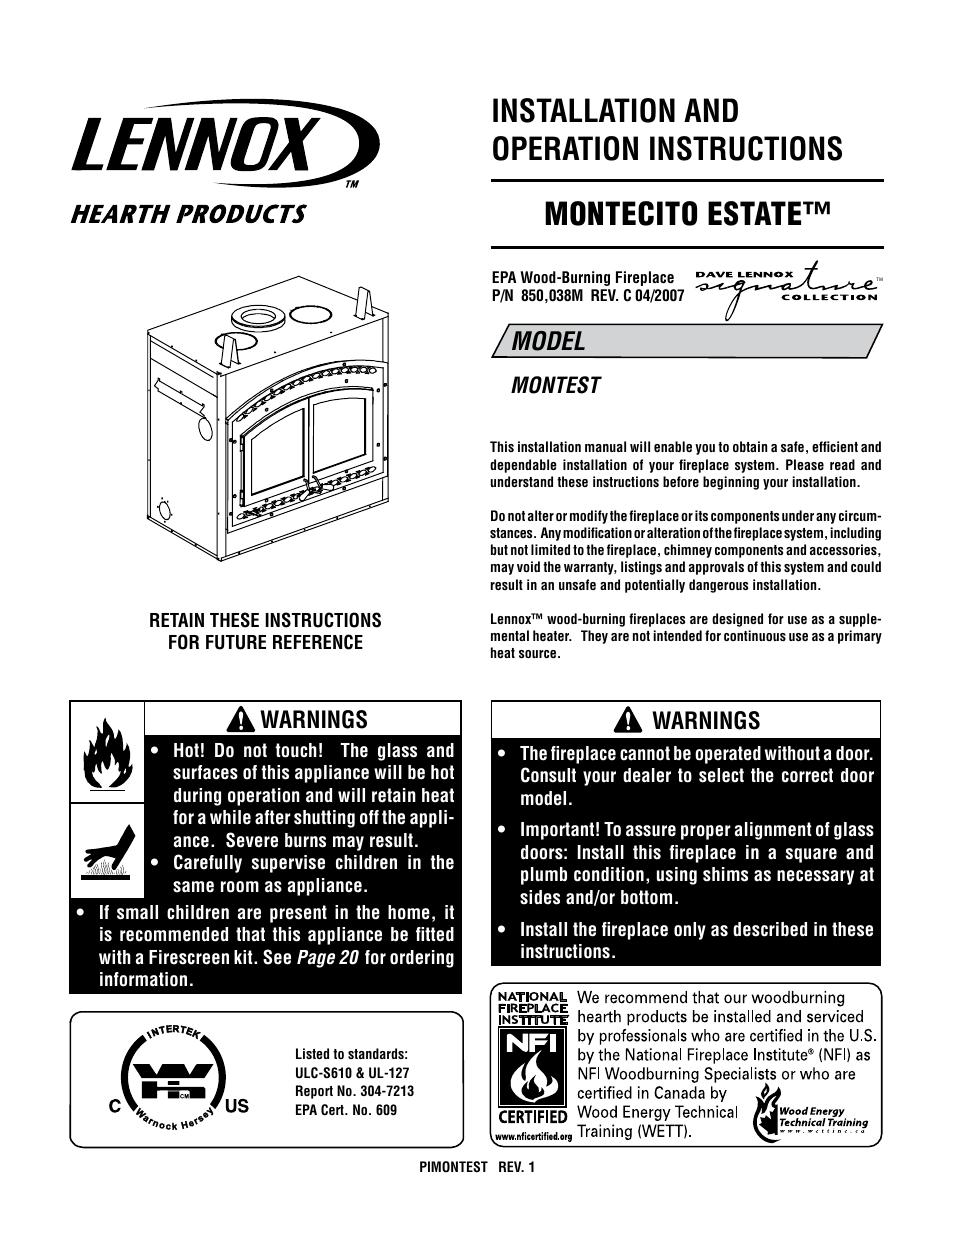 lennox international inc montecito estate montest user manual